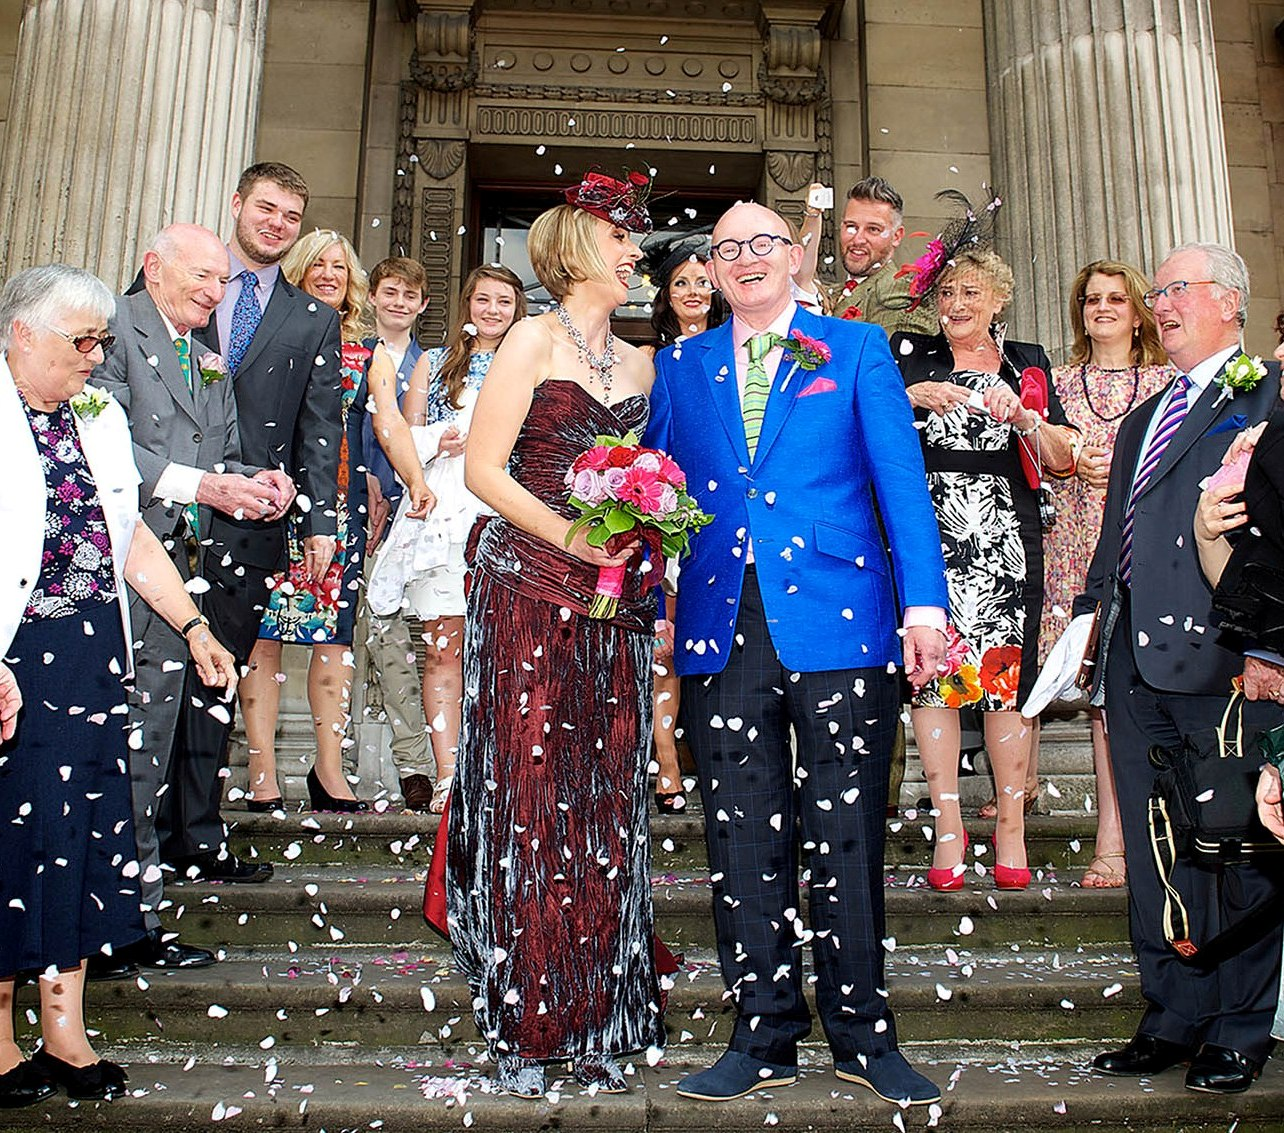 fiona-david-wedding-blue-silk-bespoke-jacket-checked-trousers-wool-cashmere-all-uk-made.jpg